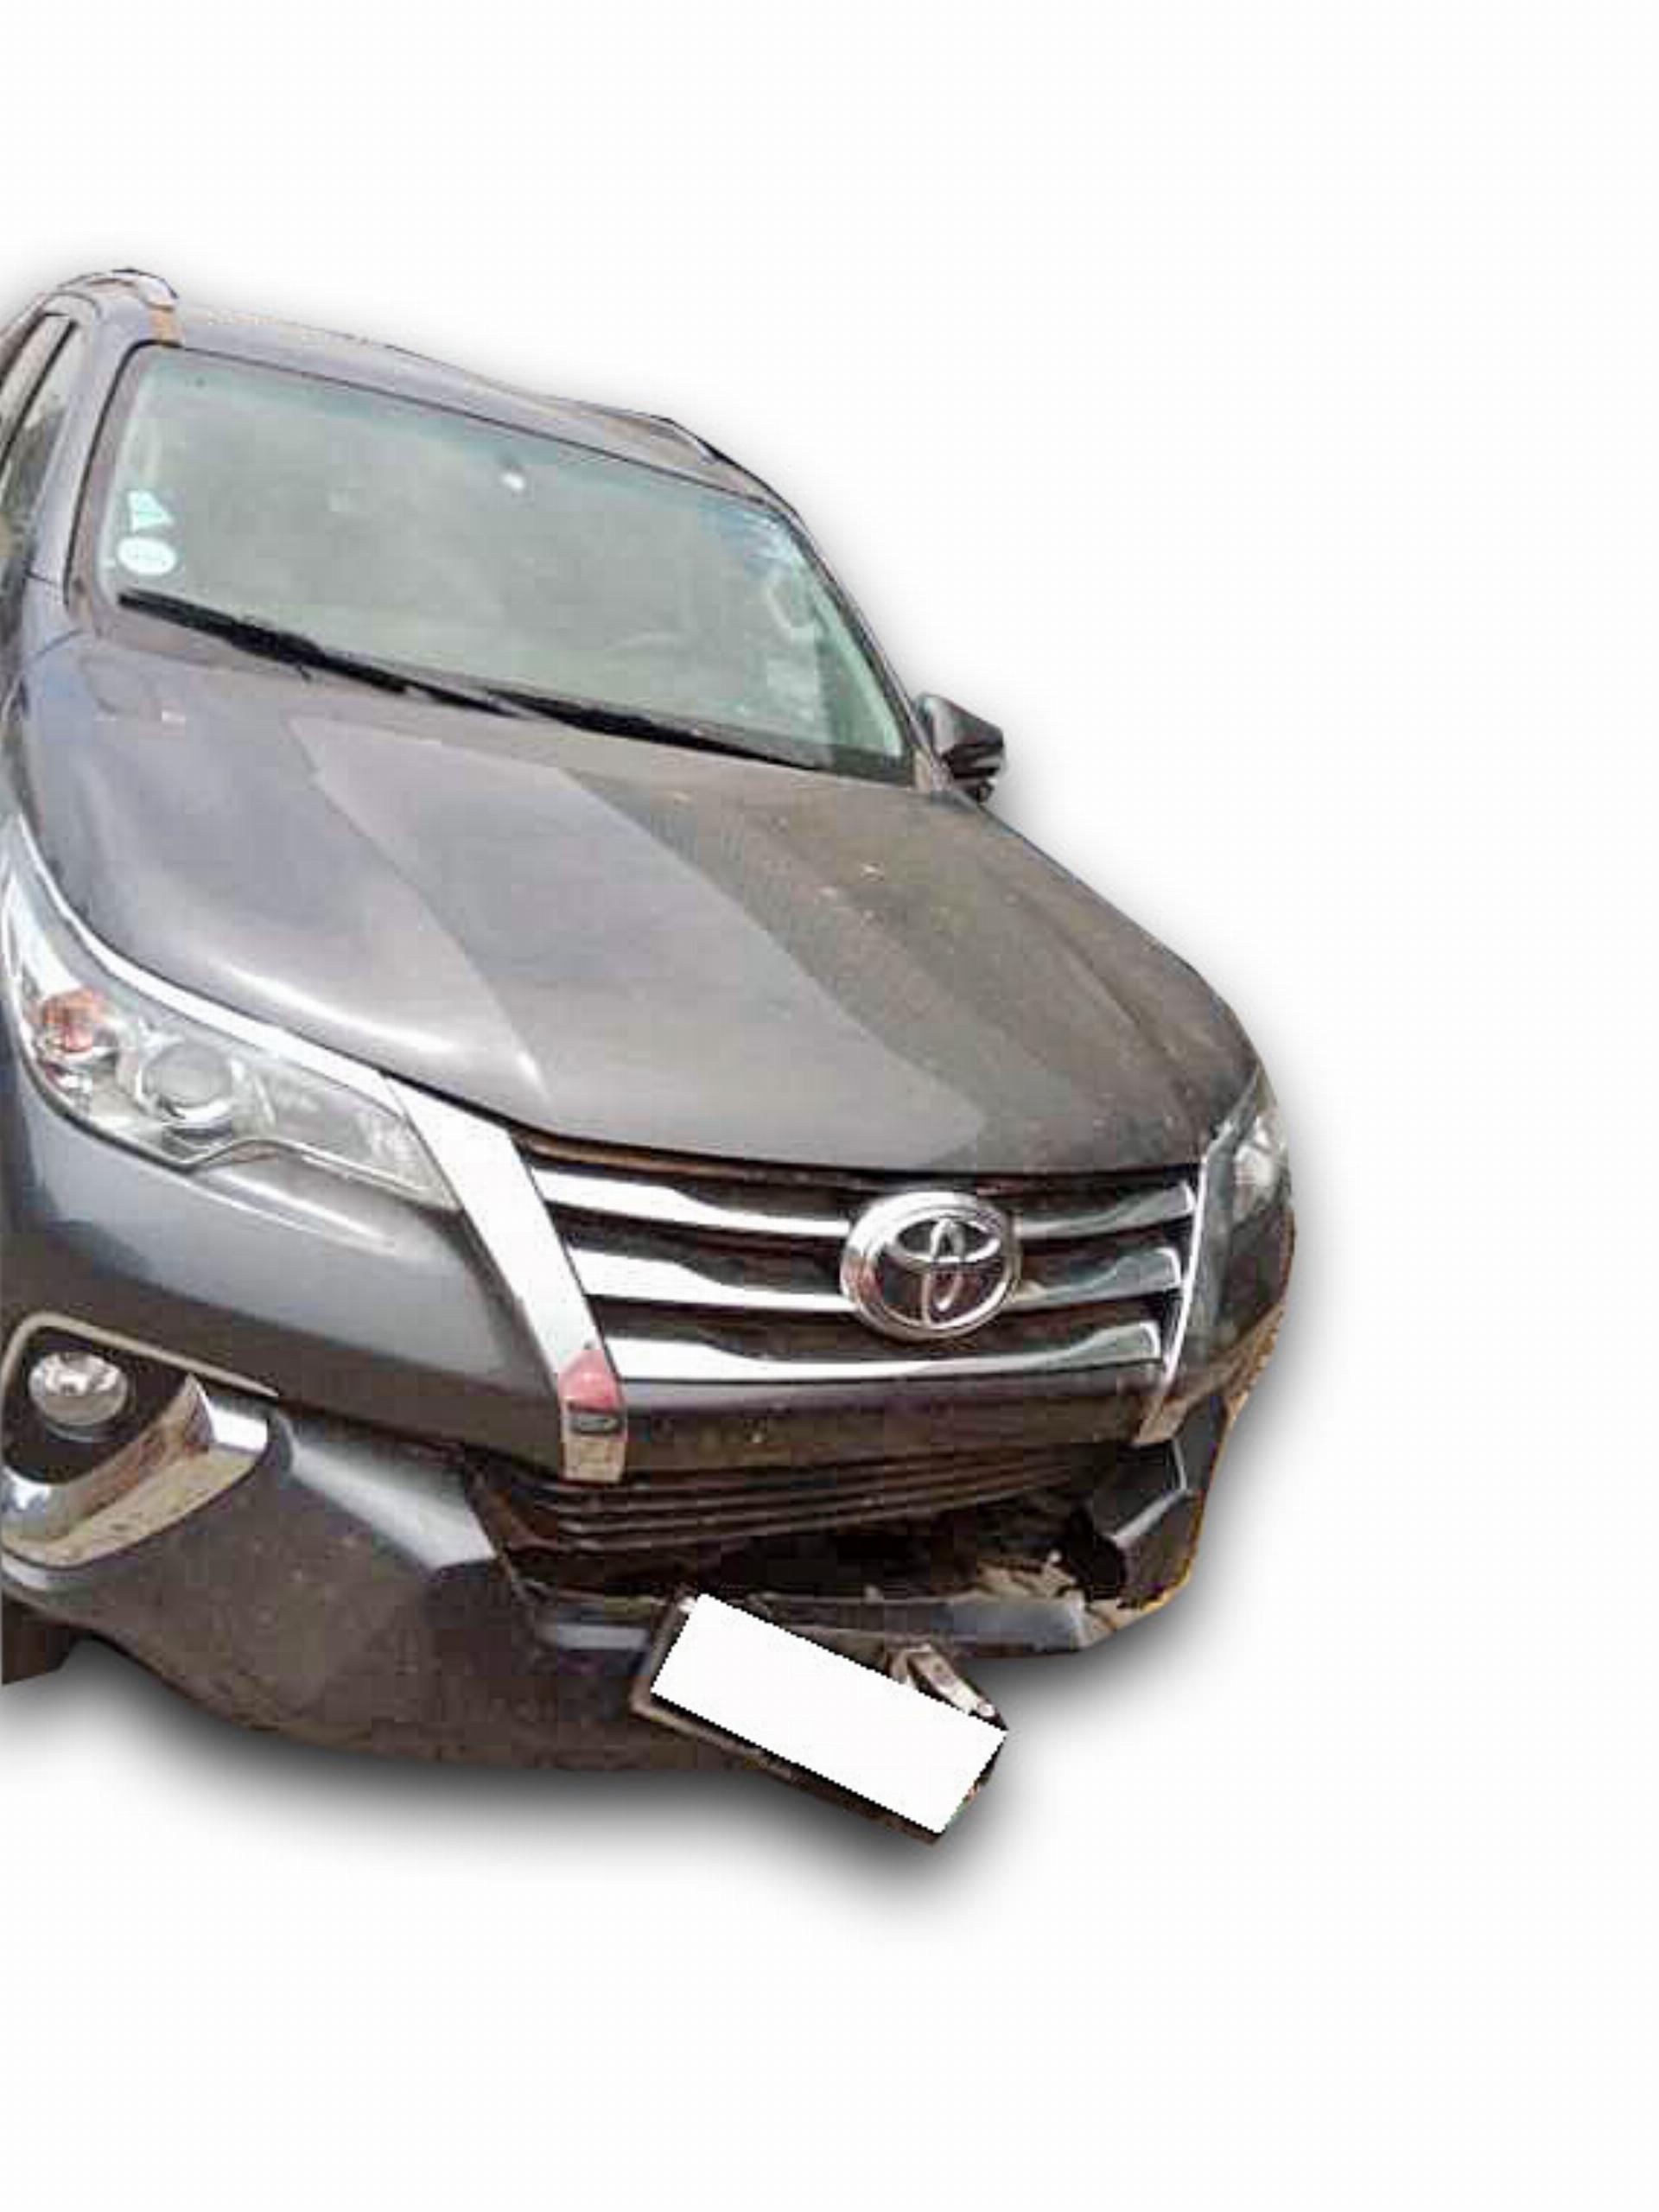 Toyota Fortuner 2.4